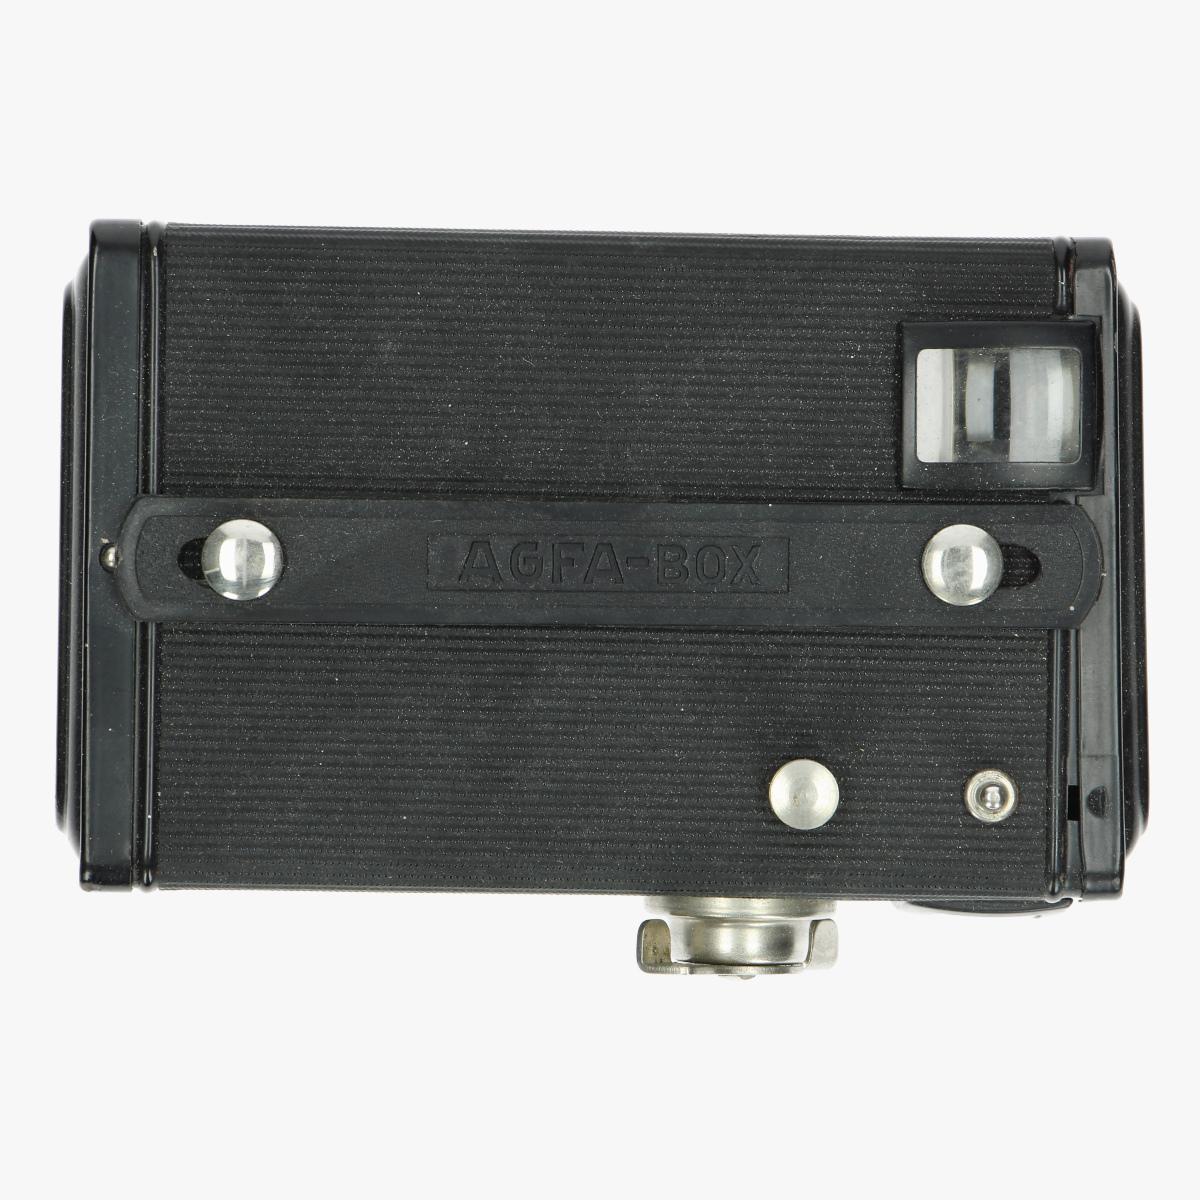 Afbeeldingen van fotocamera AGFA SYNCHRO BOX MADE IN GERMANY